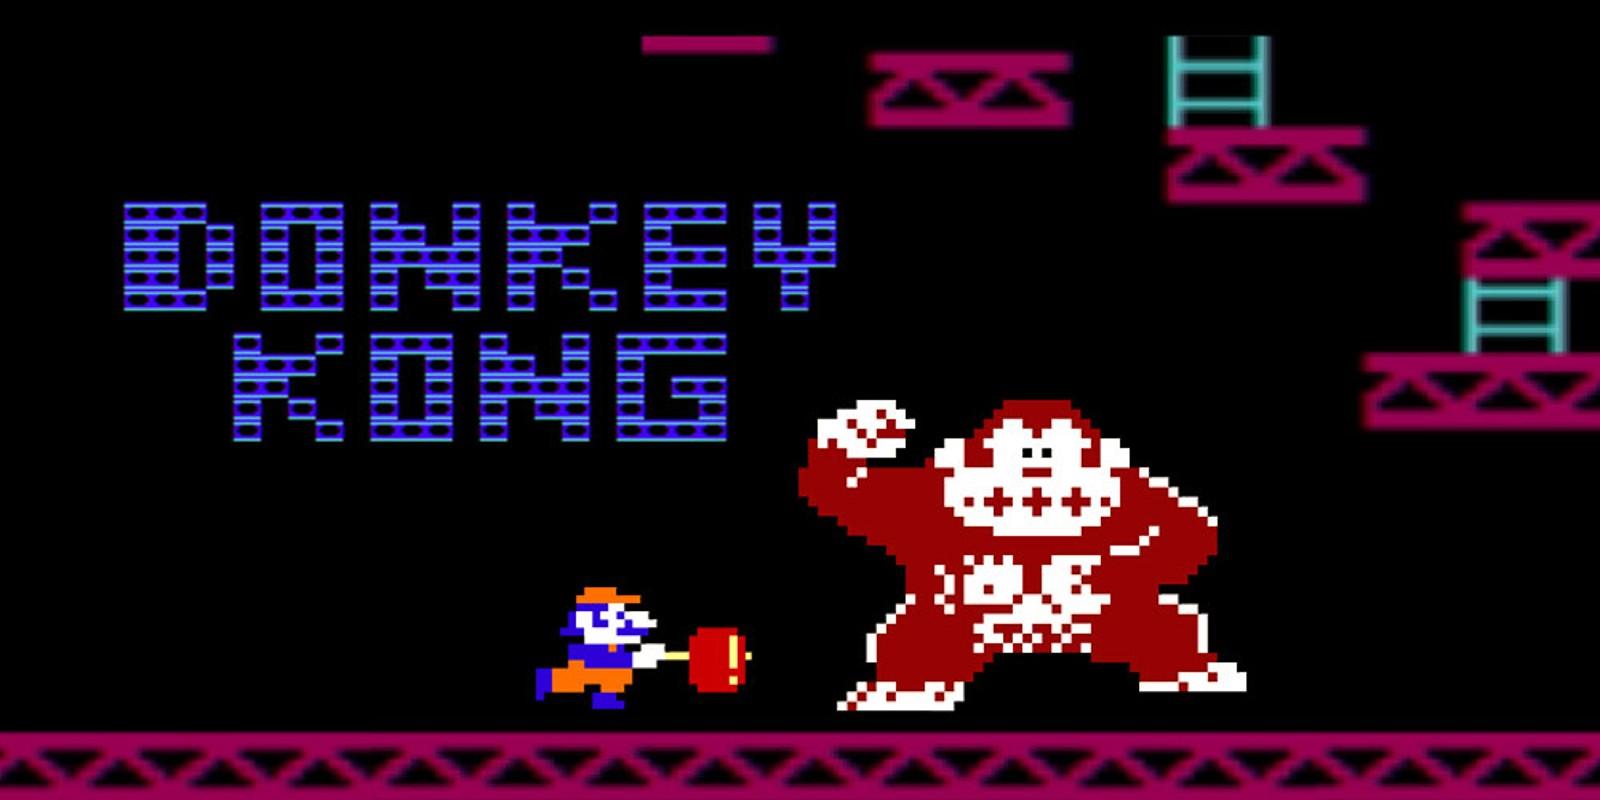 Super Metroid Hd Wallpaper Donkey Kong Nes Games Nintendo